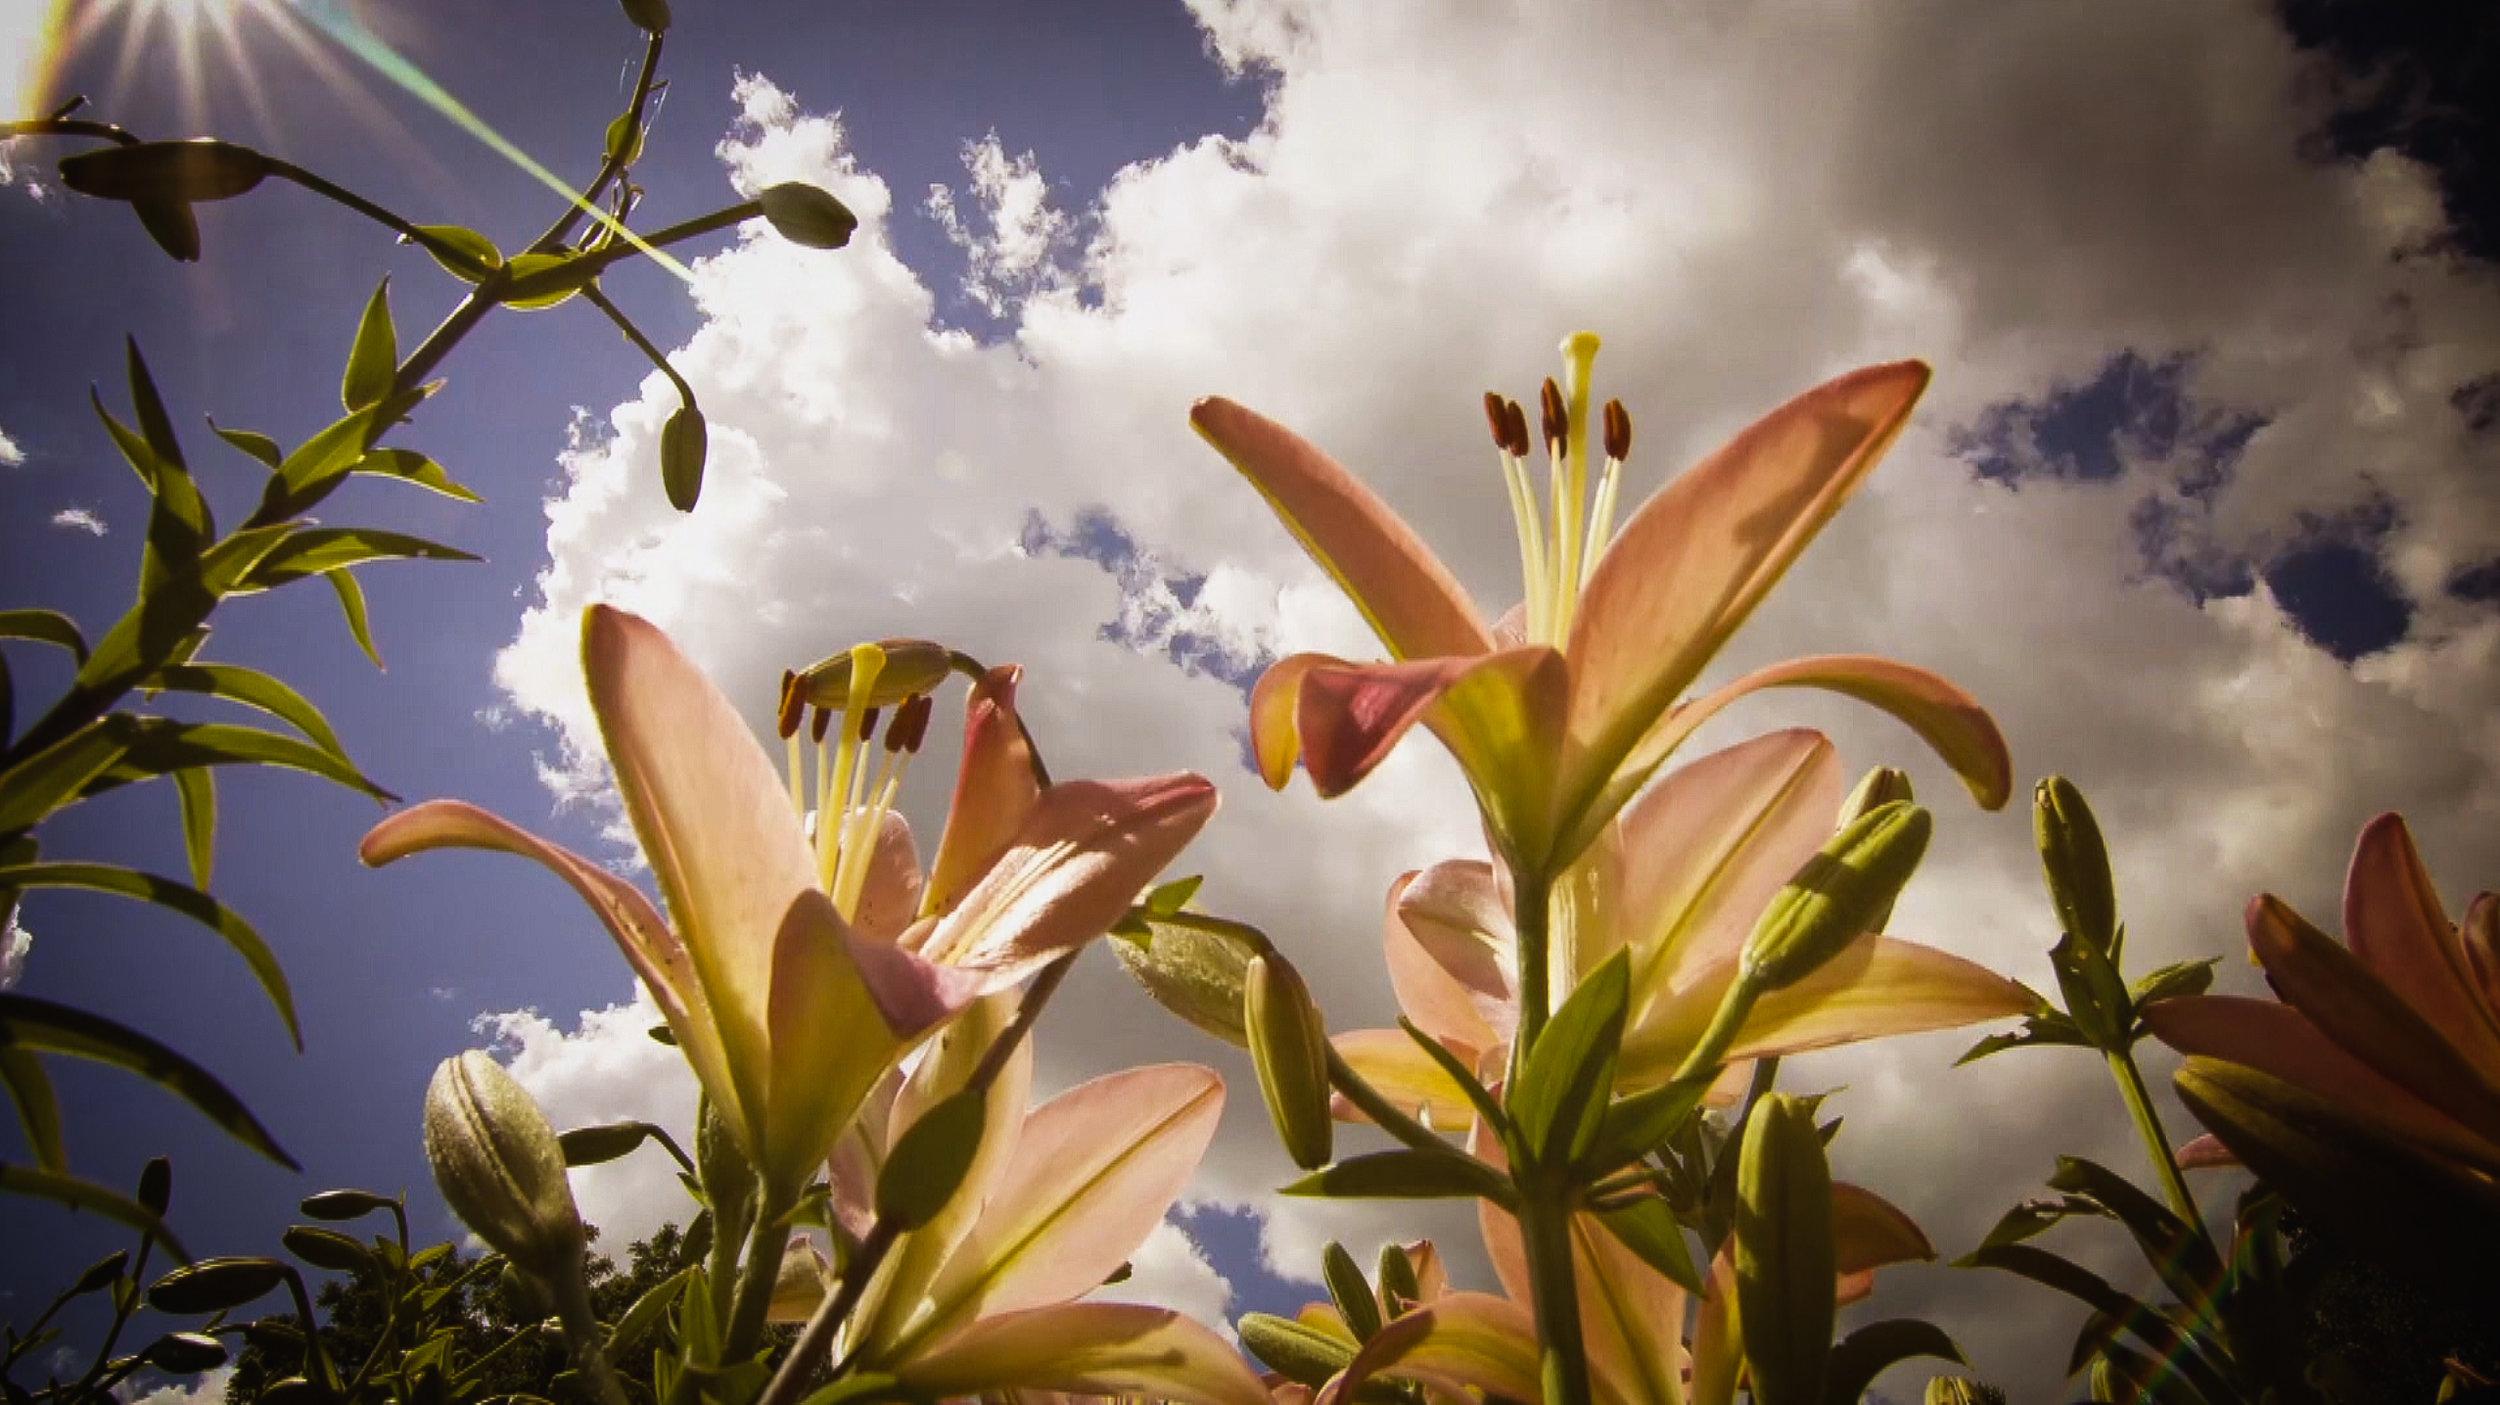 Jardins Screen shots-1.jpg